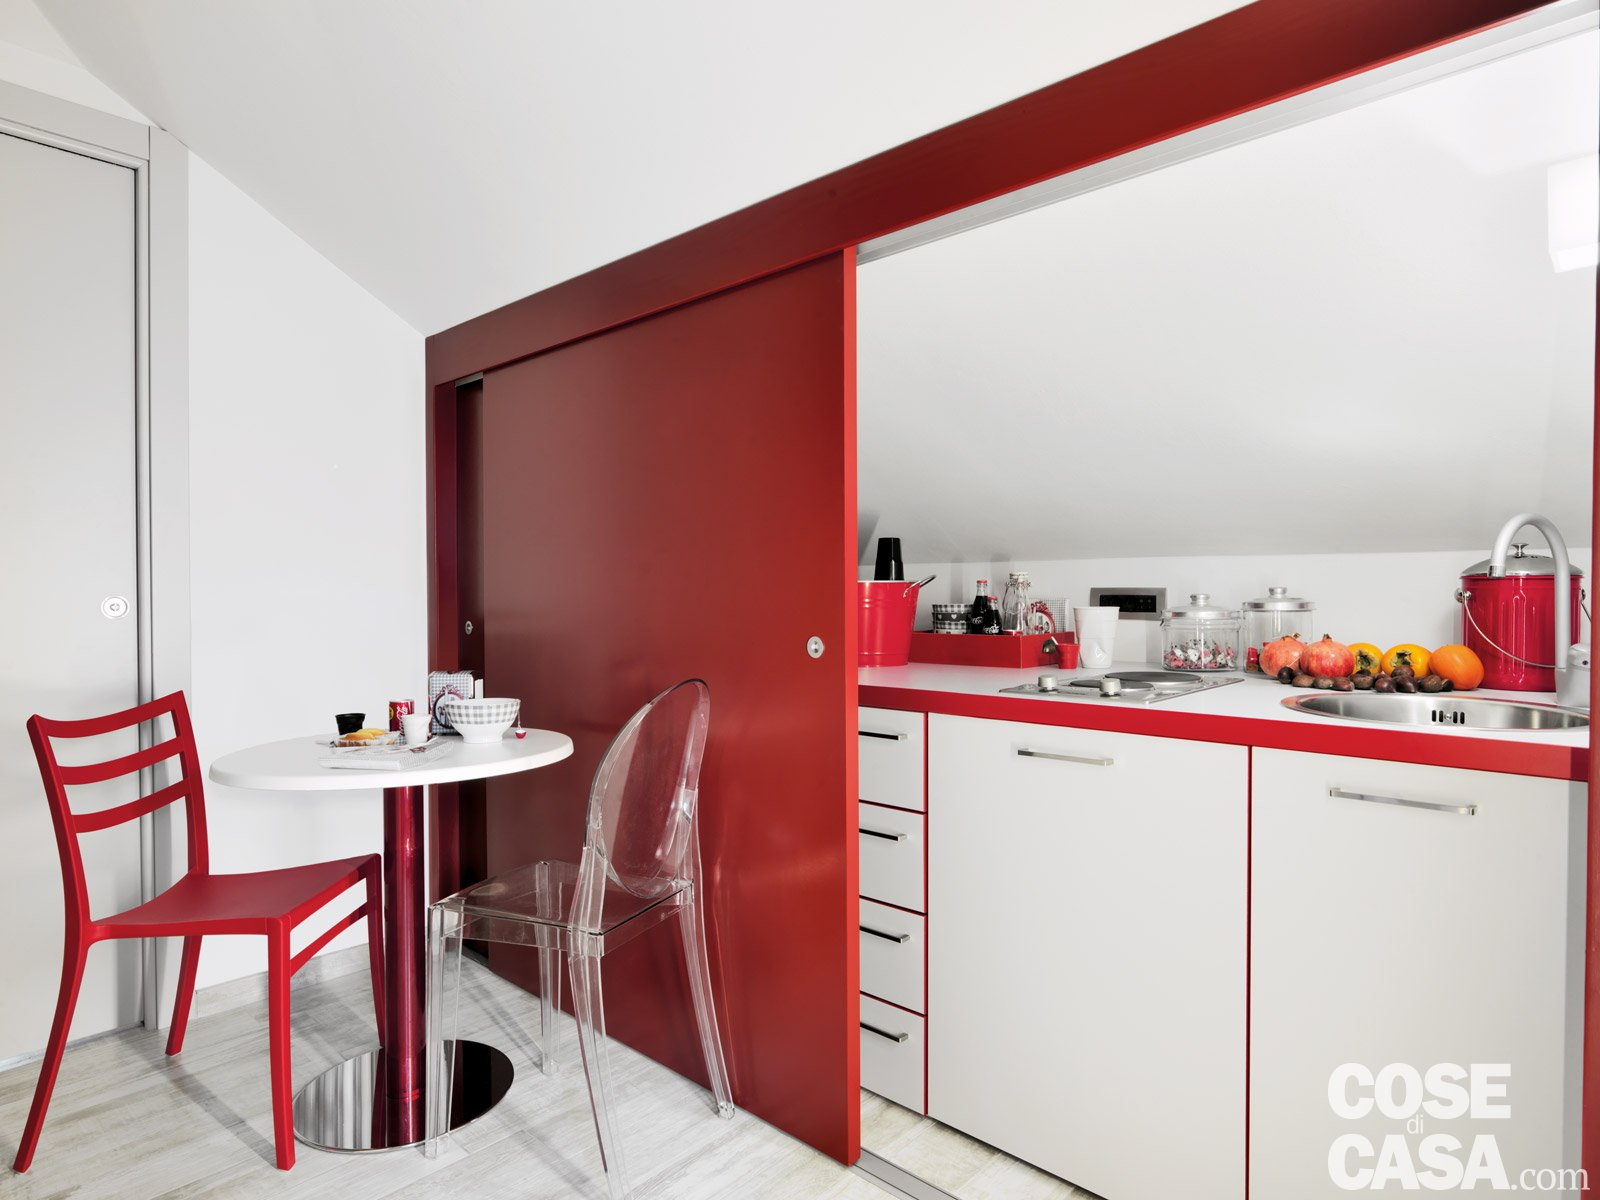 Trilocale di 96 mq recupero creativo per la mansarda cose di casa - Cucina nascosta ...